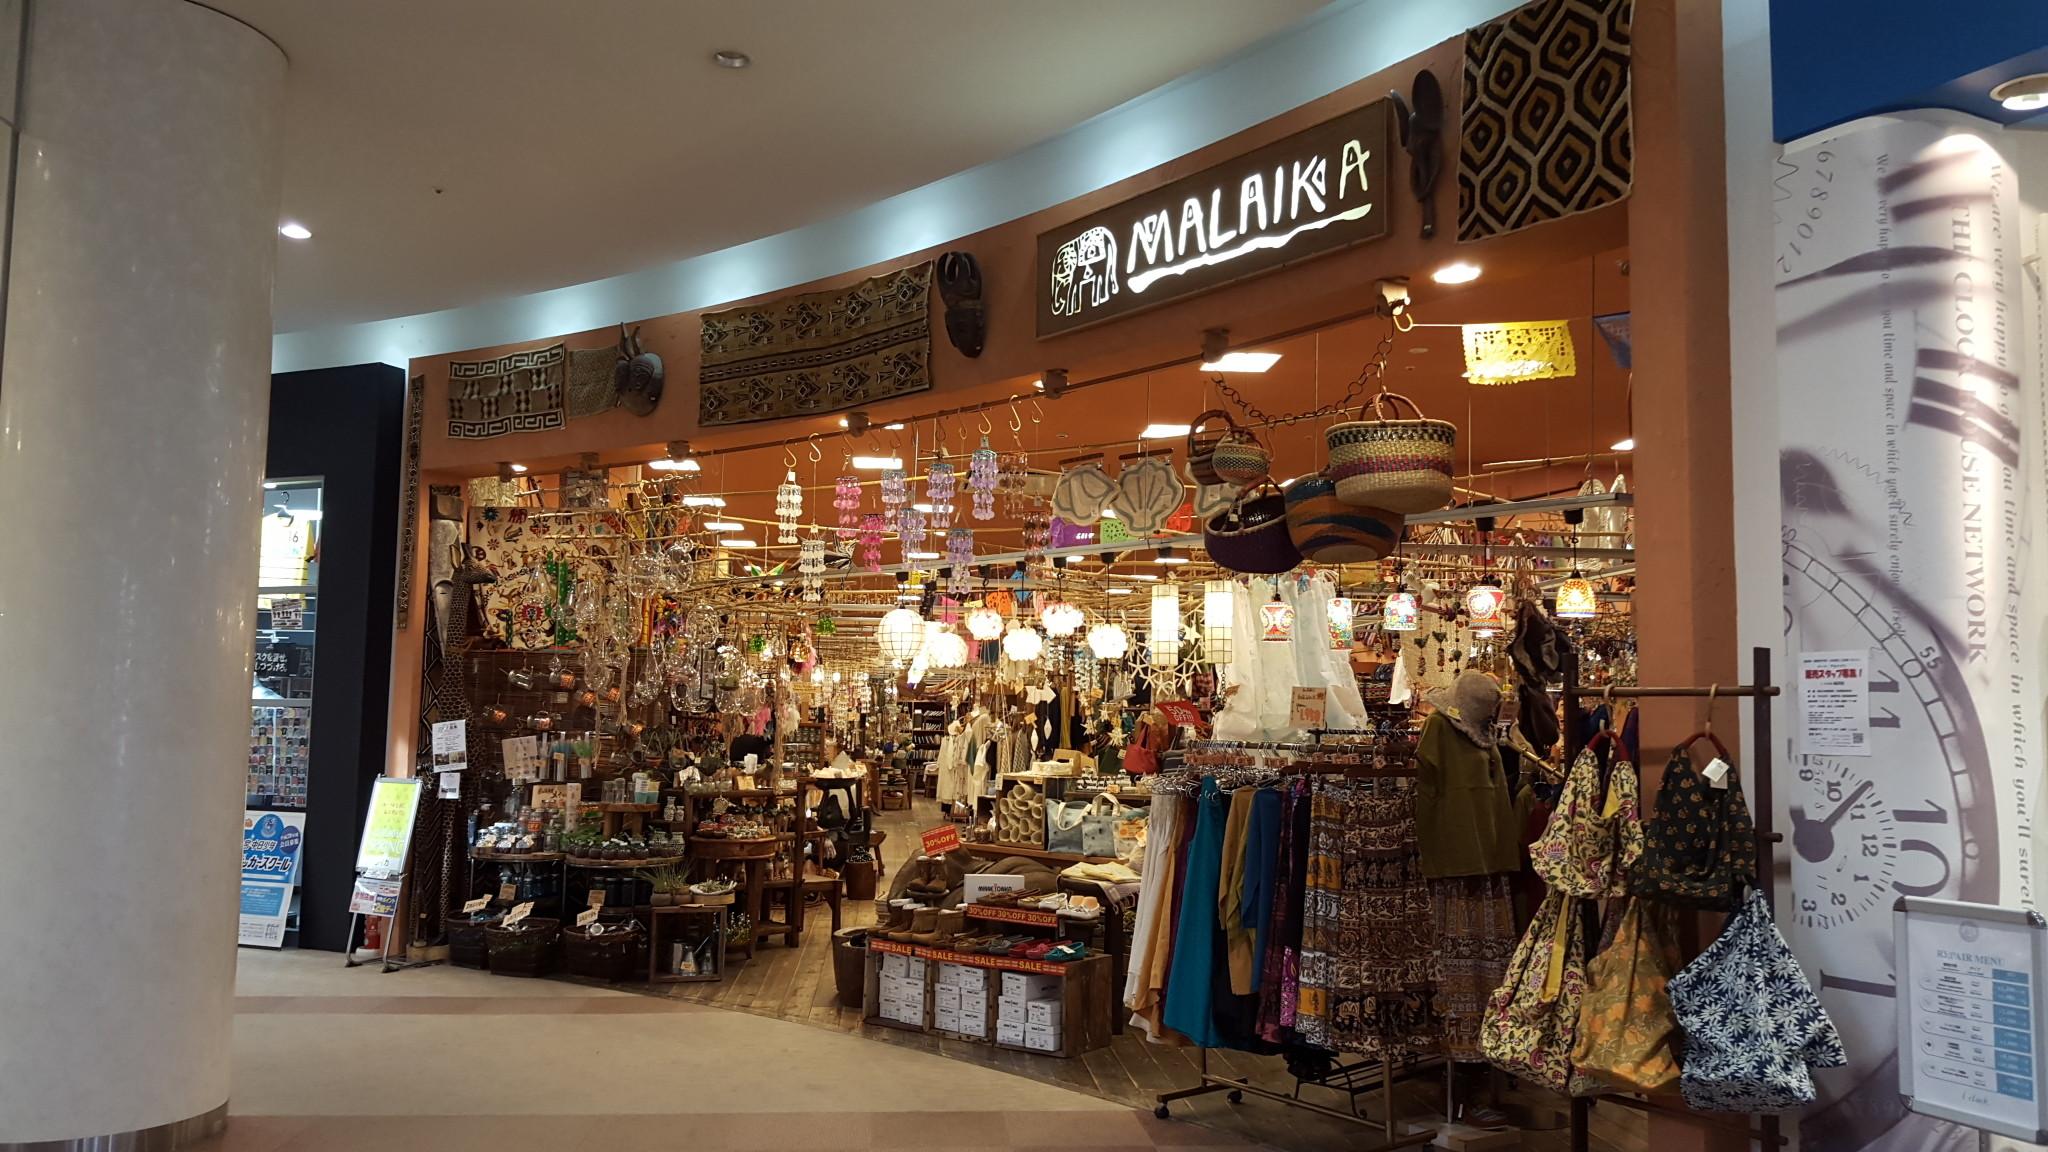 MALAIKA(マライカ) MILA MARK IS 静岡店 のアルバイト情報